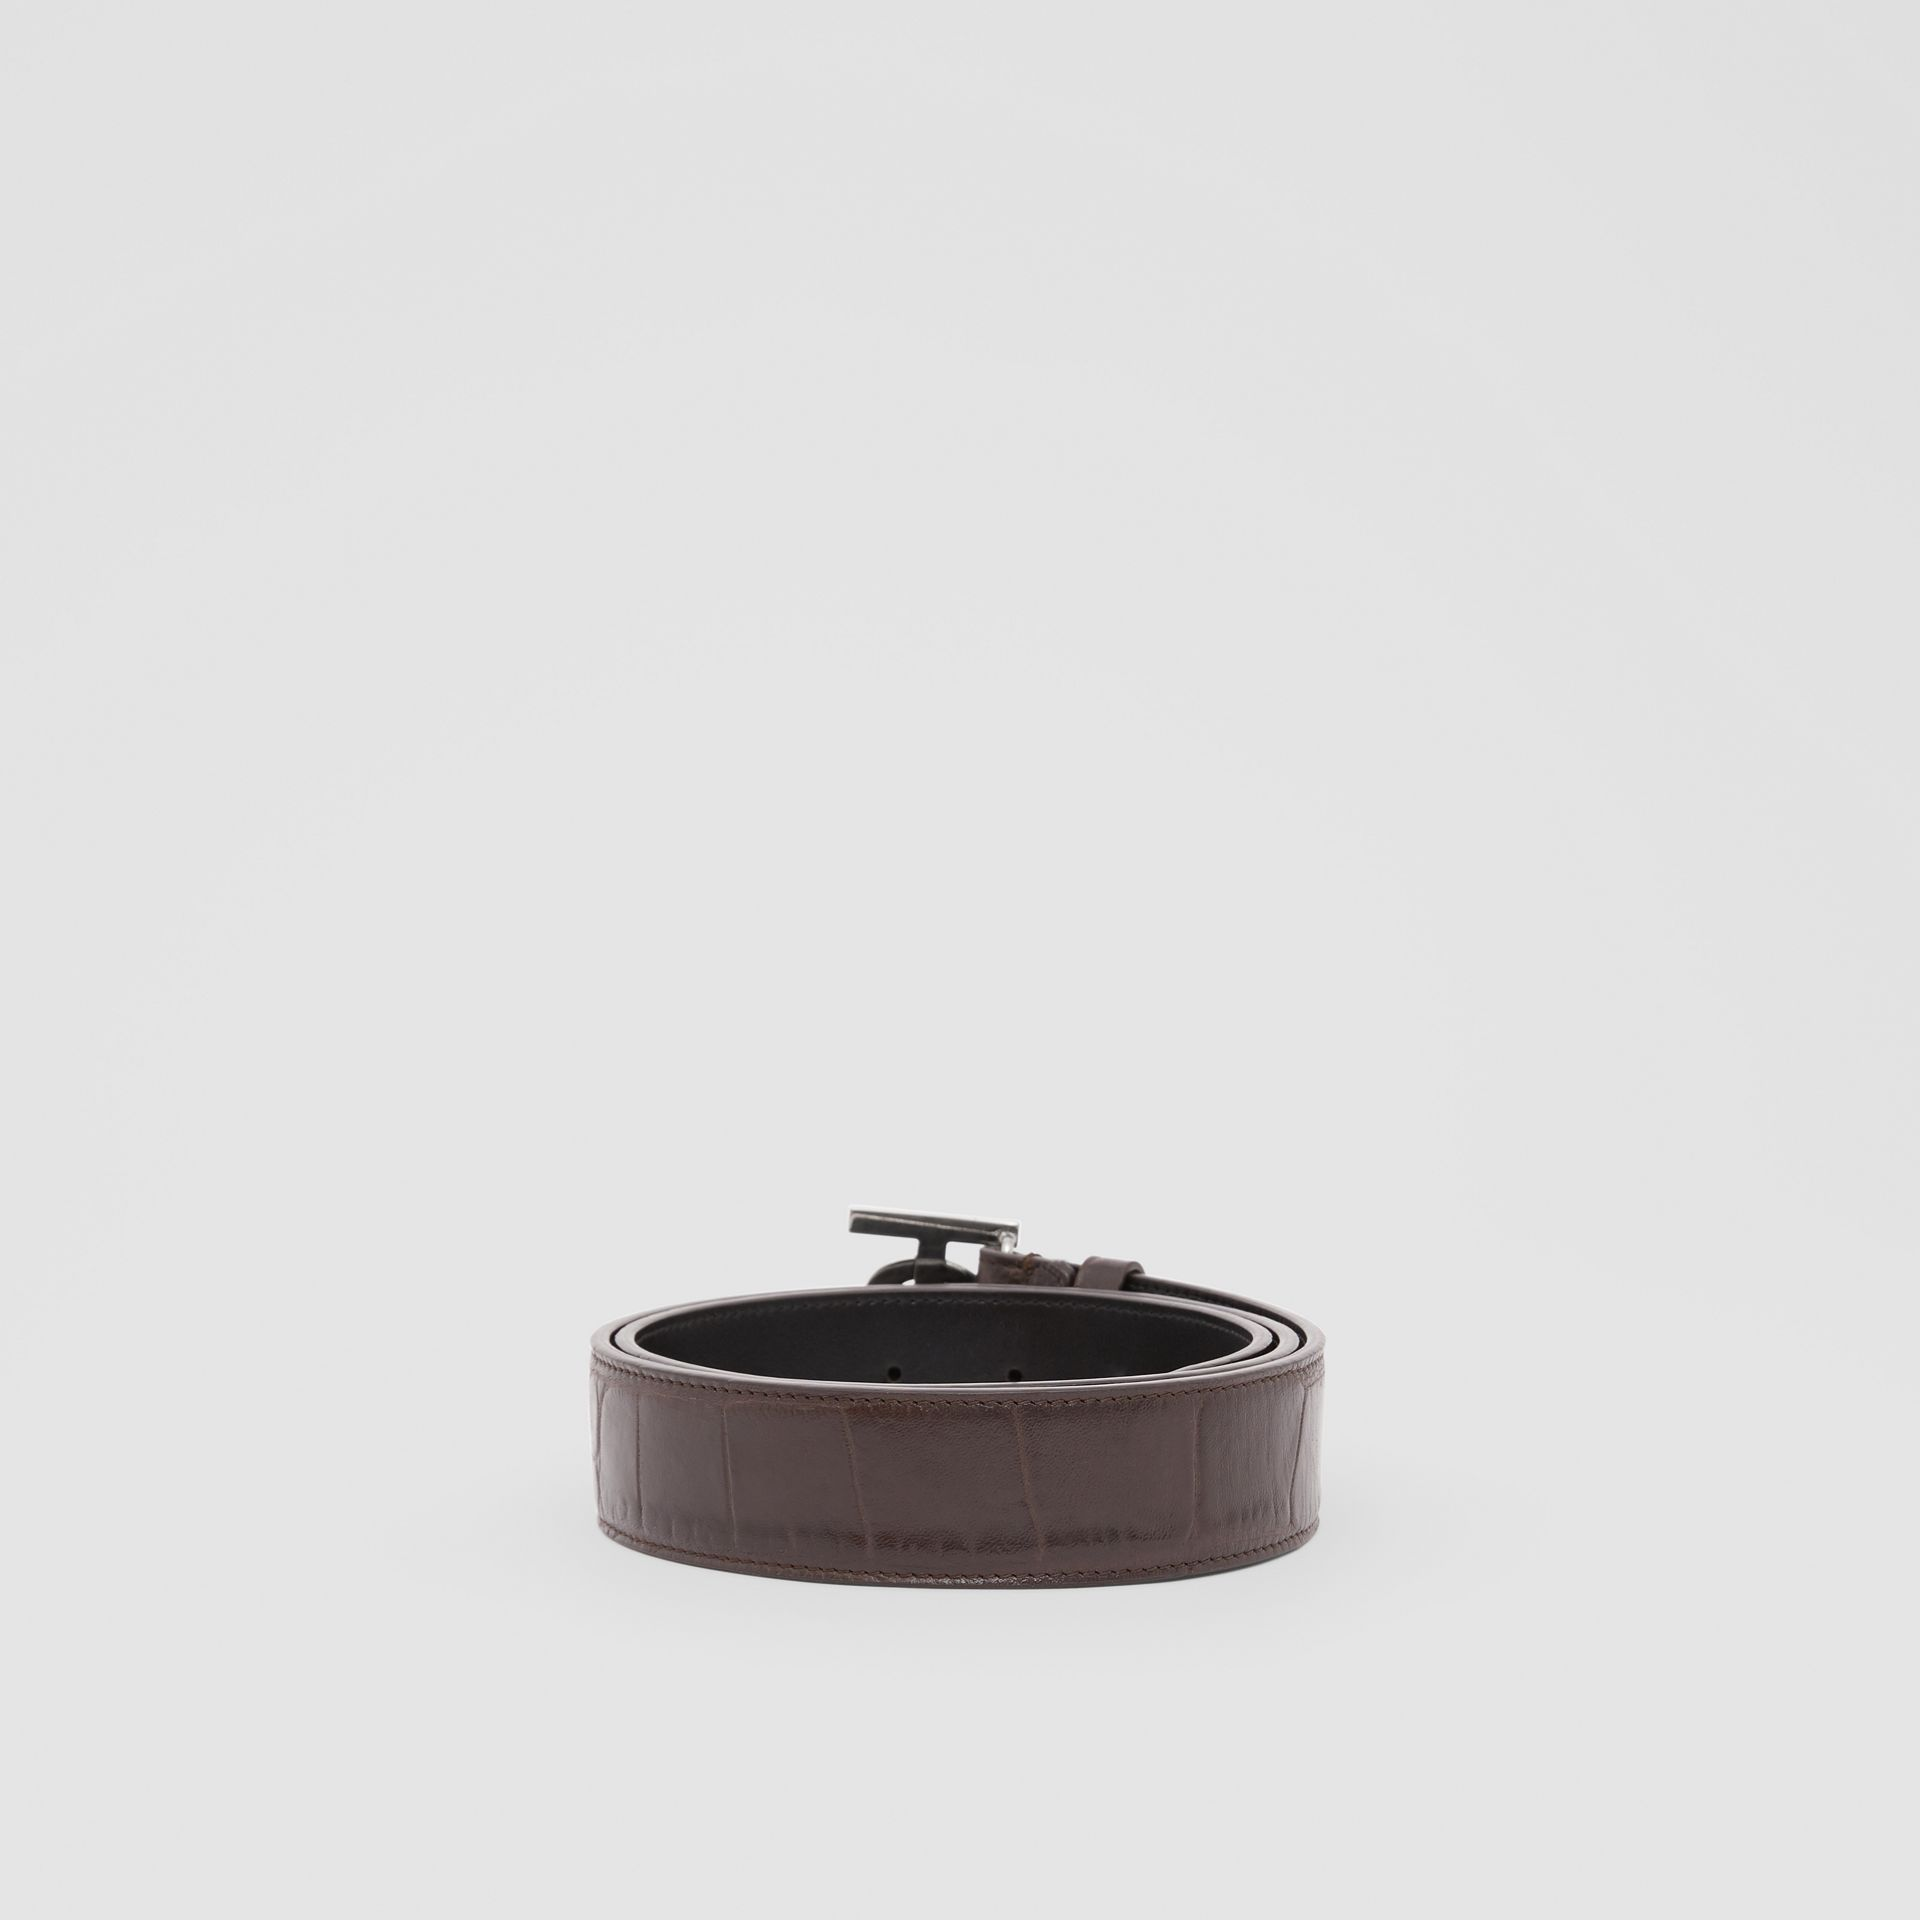 Monogram Motif Embossed Leather Belt in Brown - Men | Burberry - gallery image 4